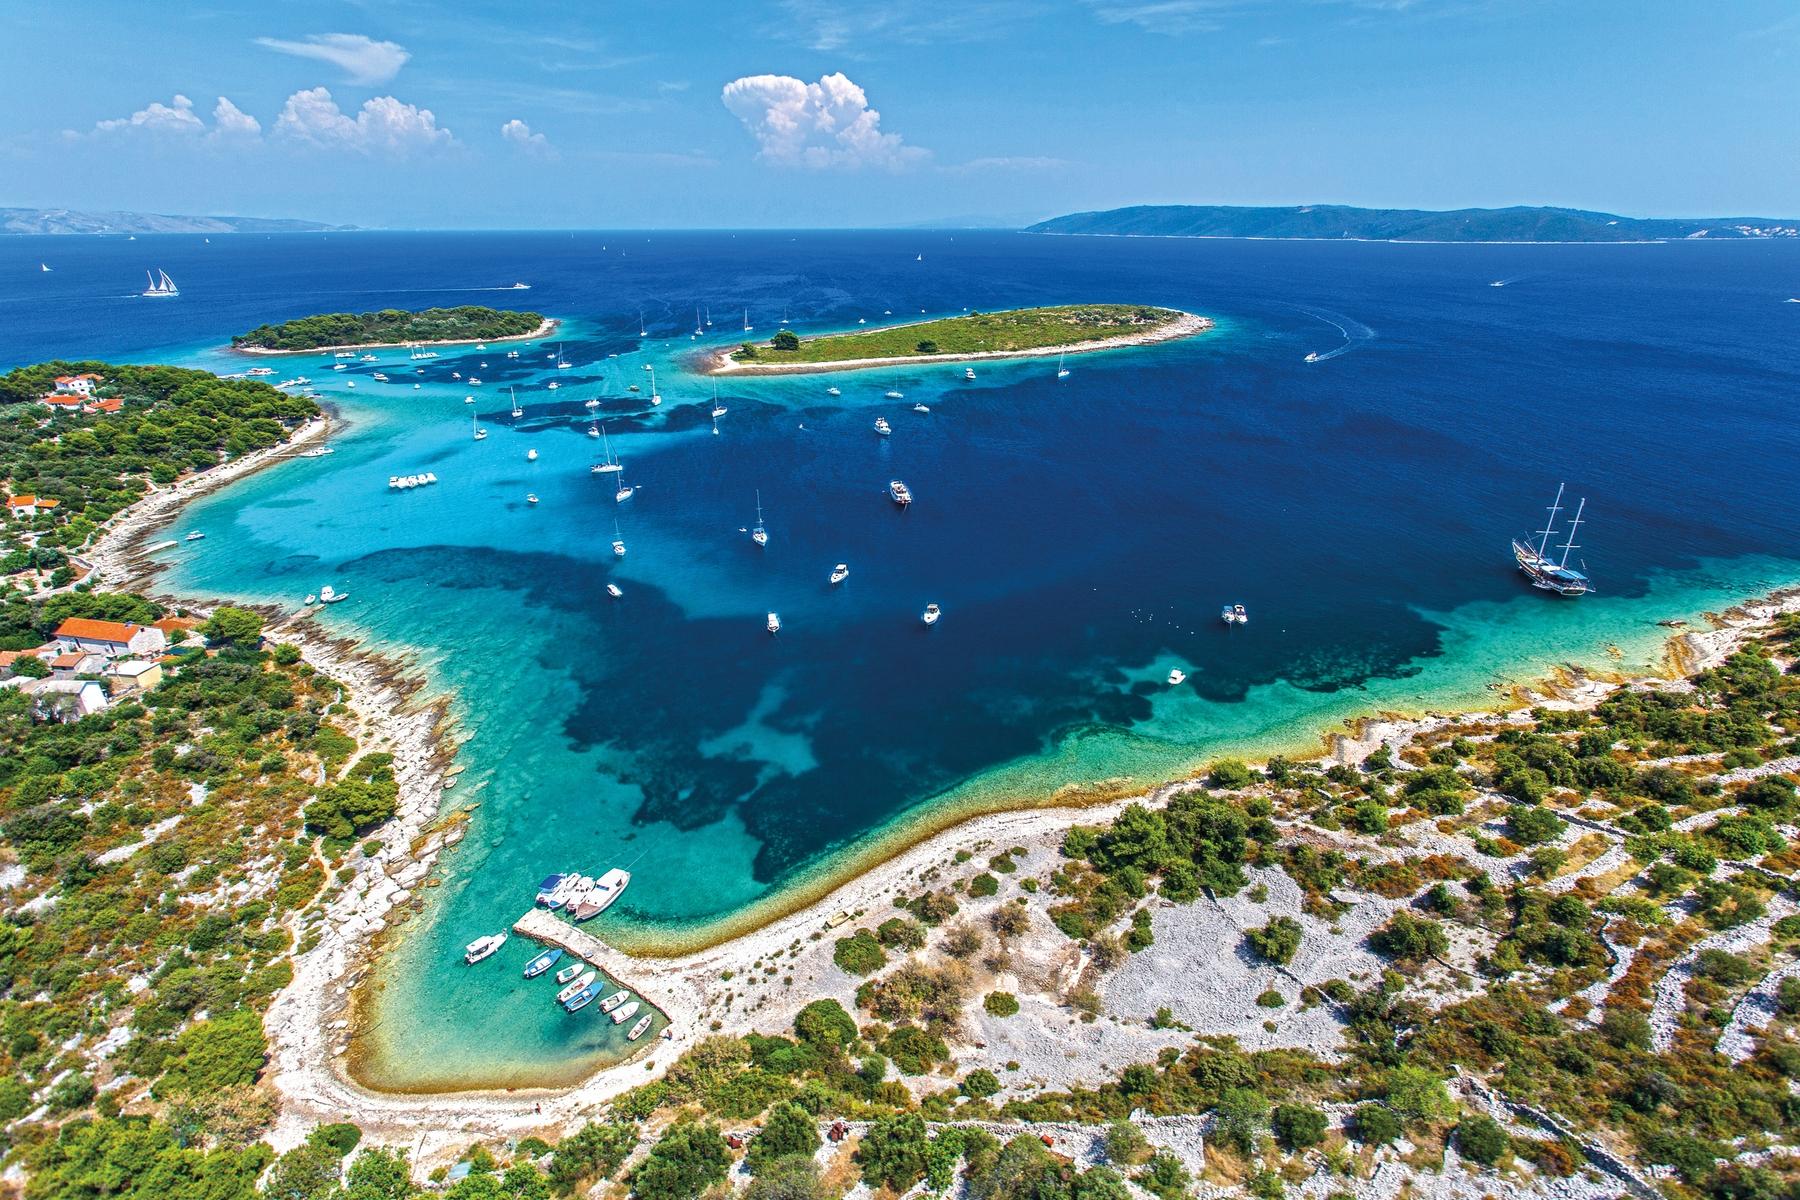 Günstiger All-inclusive-Urlaub in Kroatien